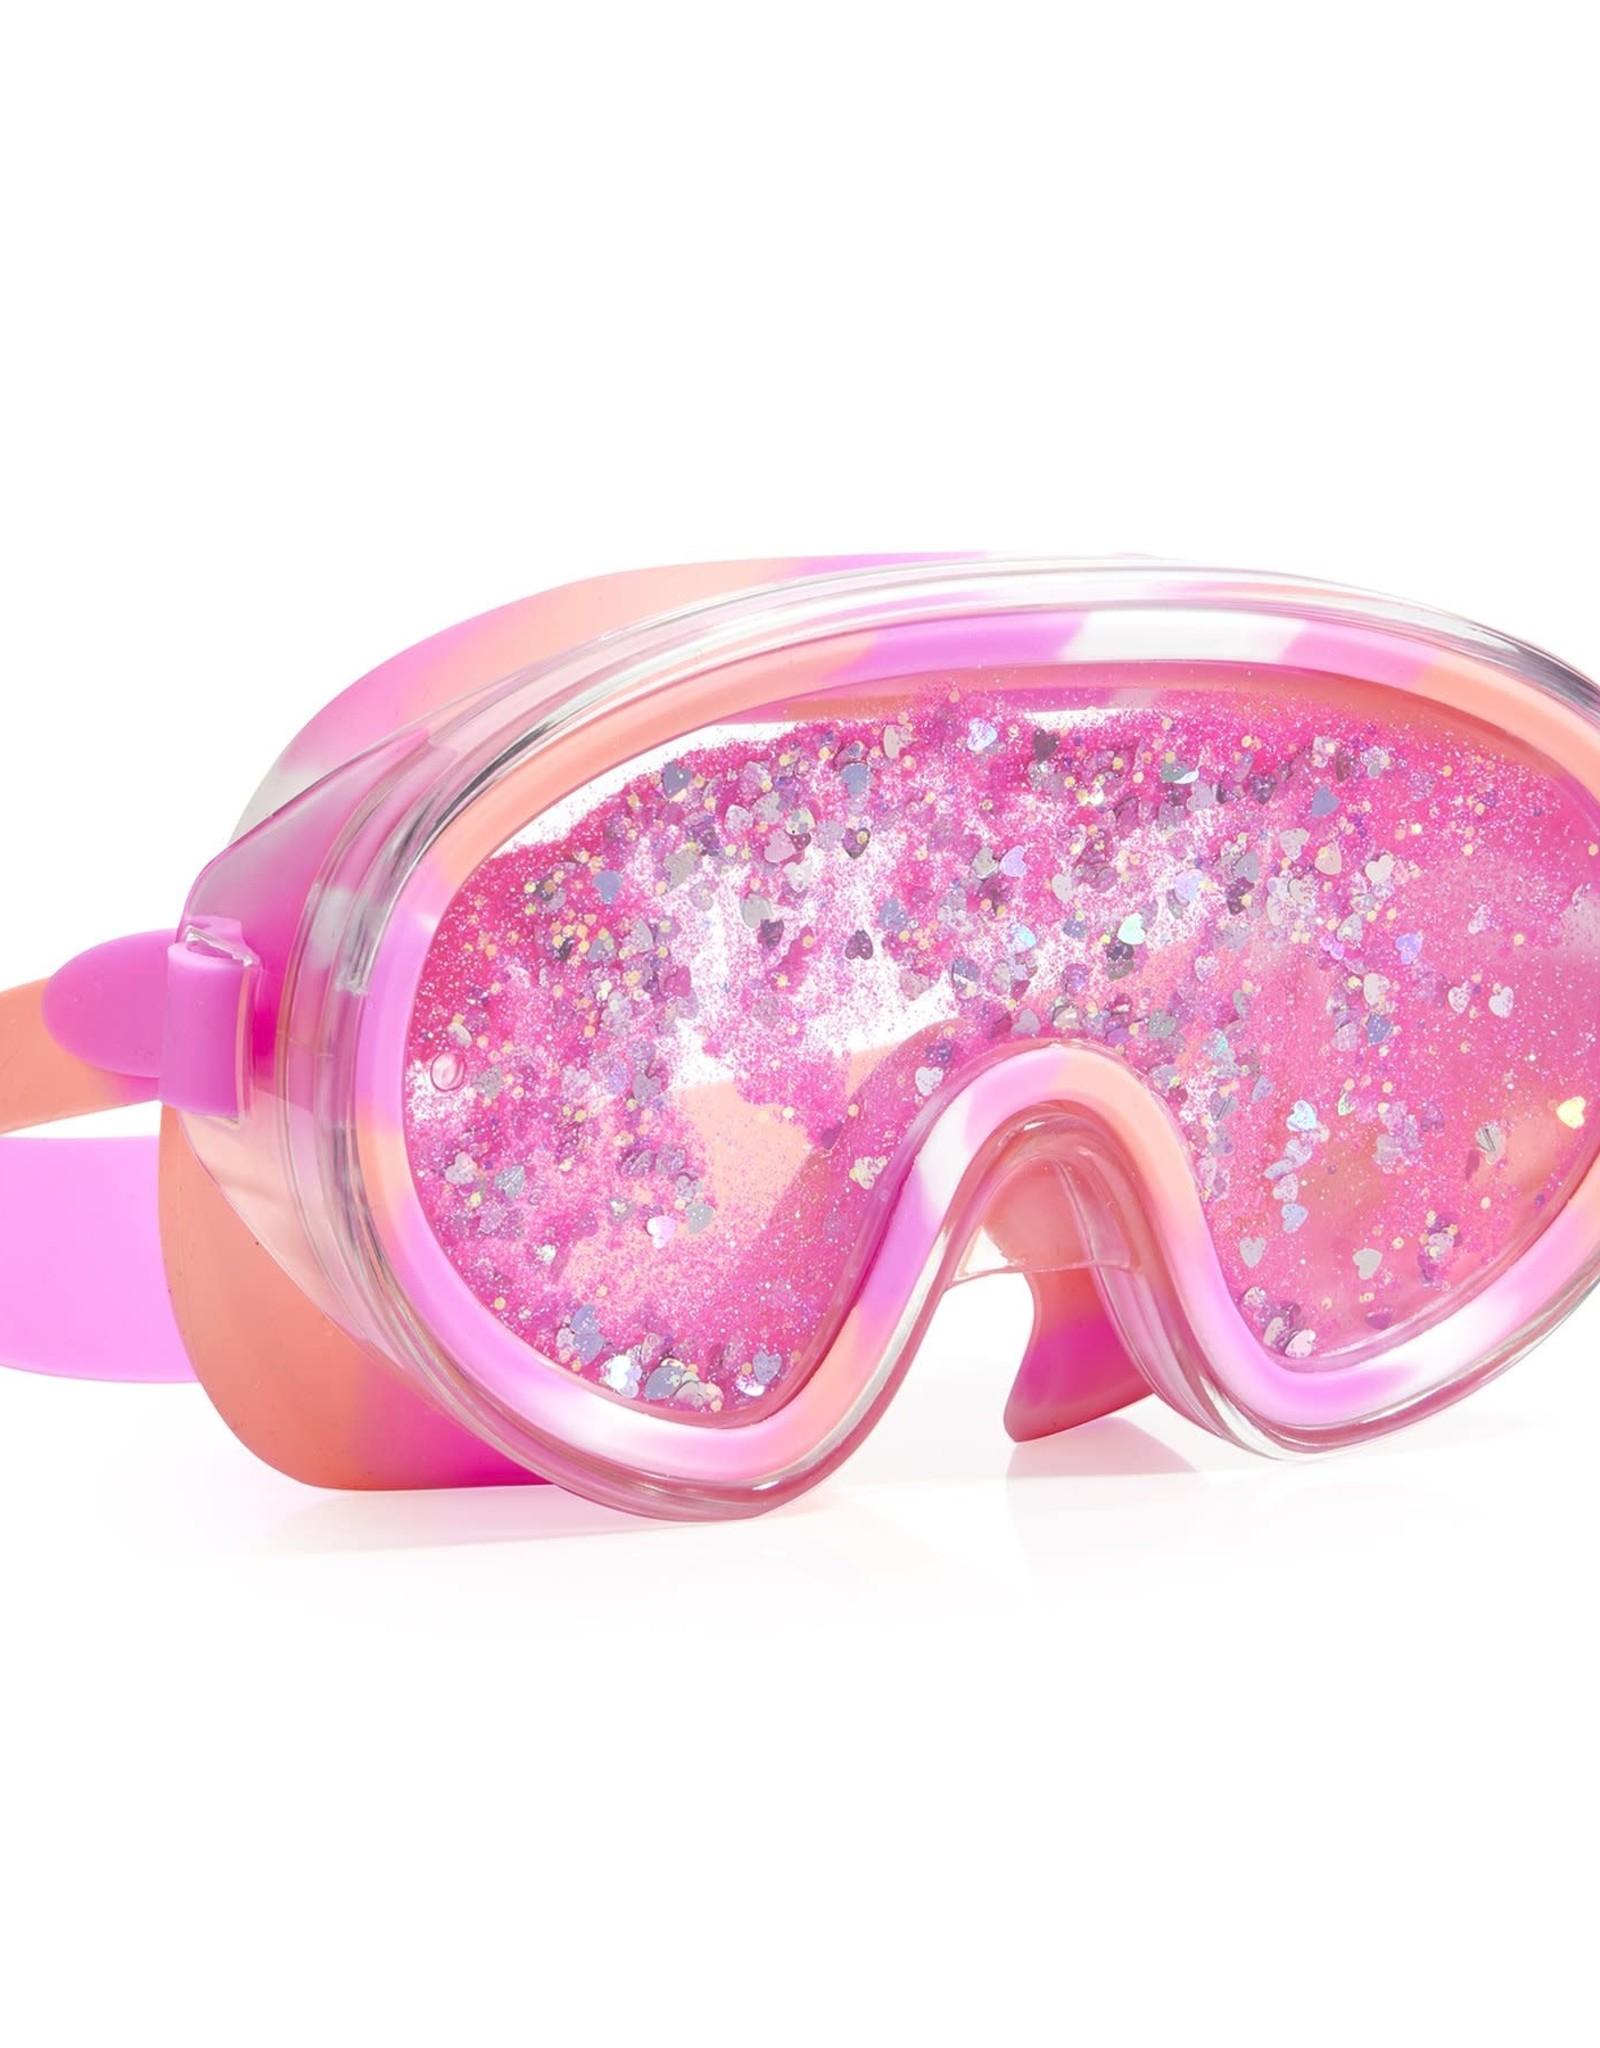 Bling 2O Beach Life mask Sand Art Pink